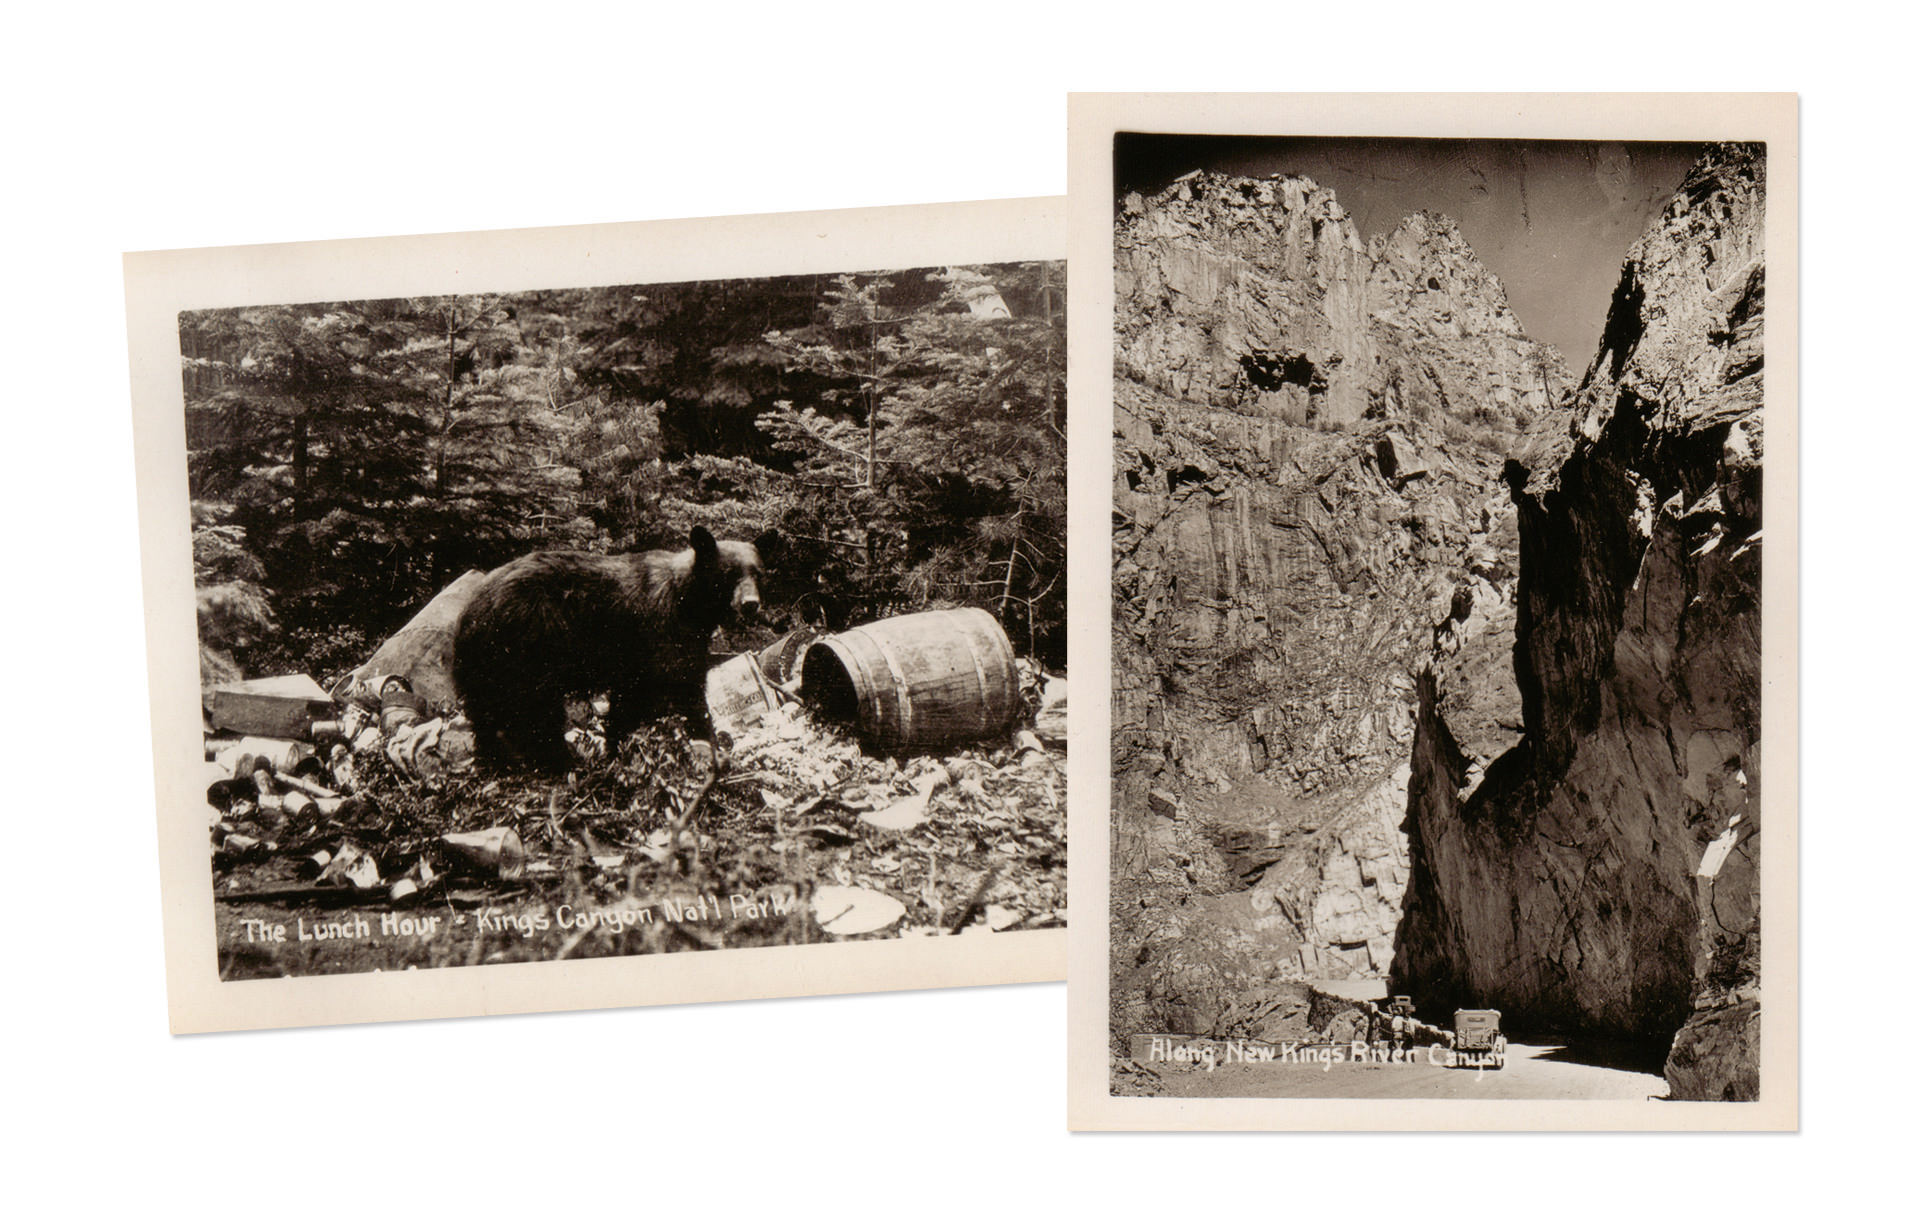 Kings Canyon National Park Antique Photographs